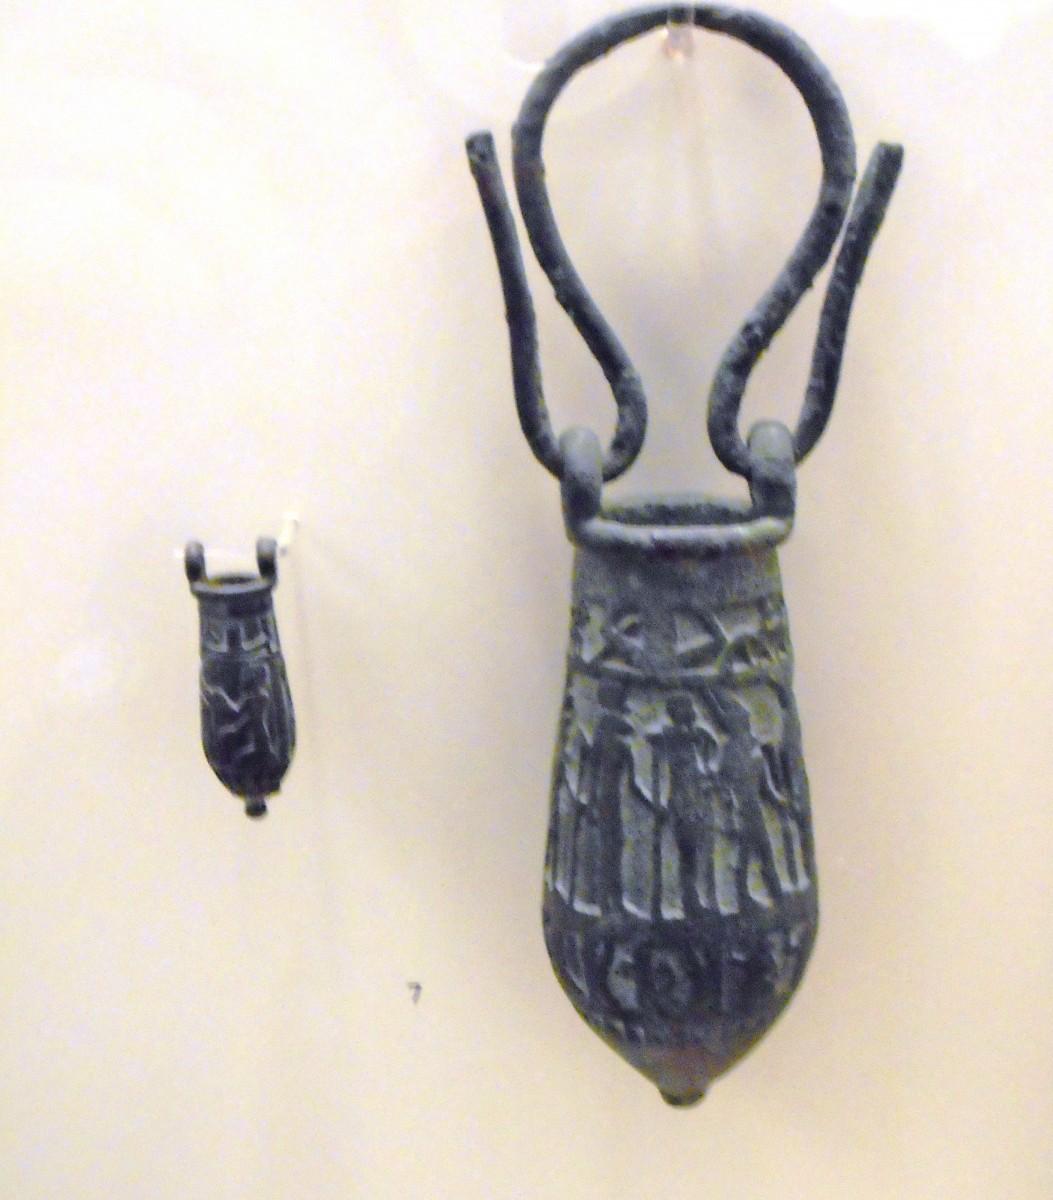 Votive bronze vessels